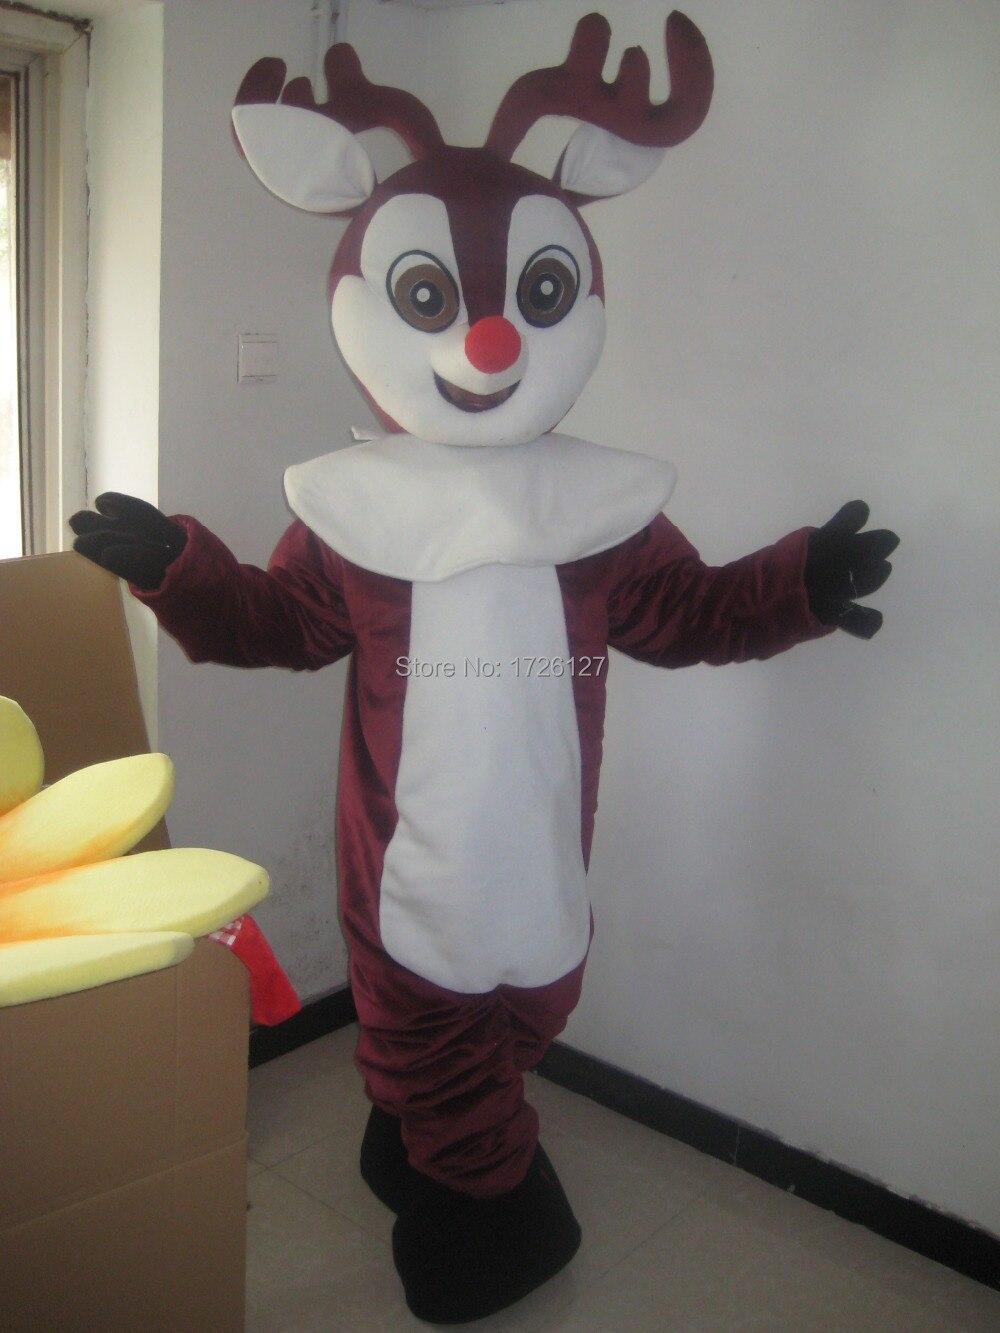 mascot Reindeer Moose red nose Deer Mascot costume custom fancy costume anime cosplaymascotte fancy dress